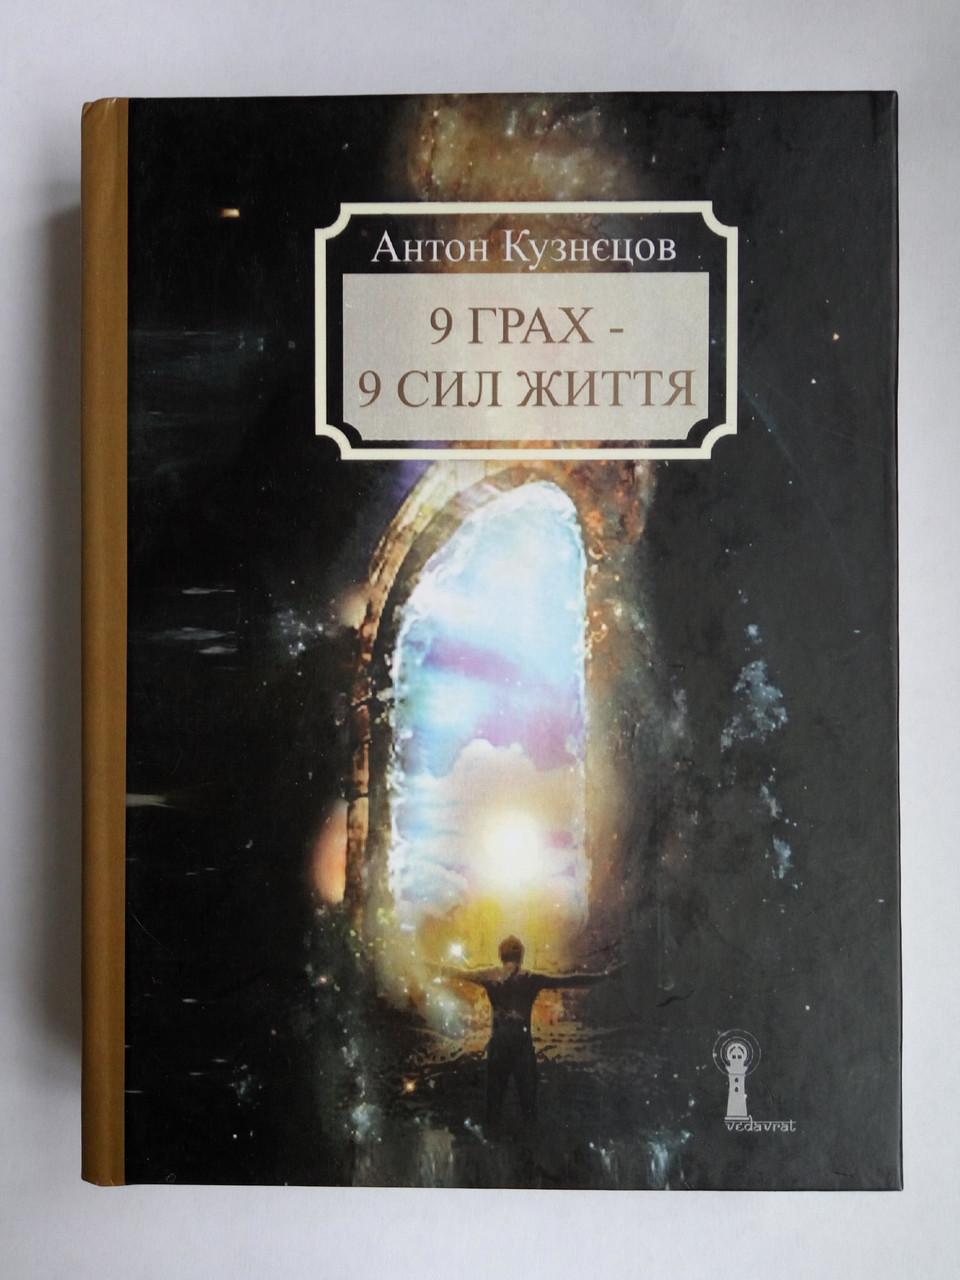 9 грах - 9 сил життя, Антон Кузнєцов